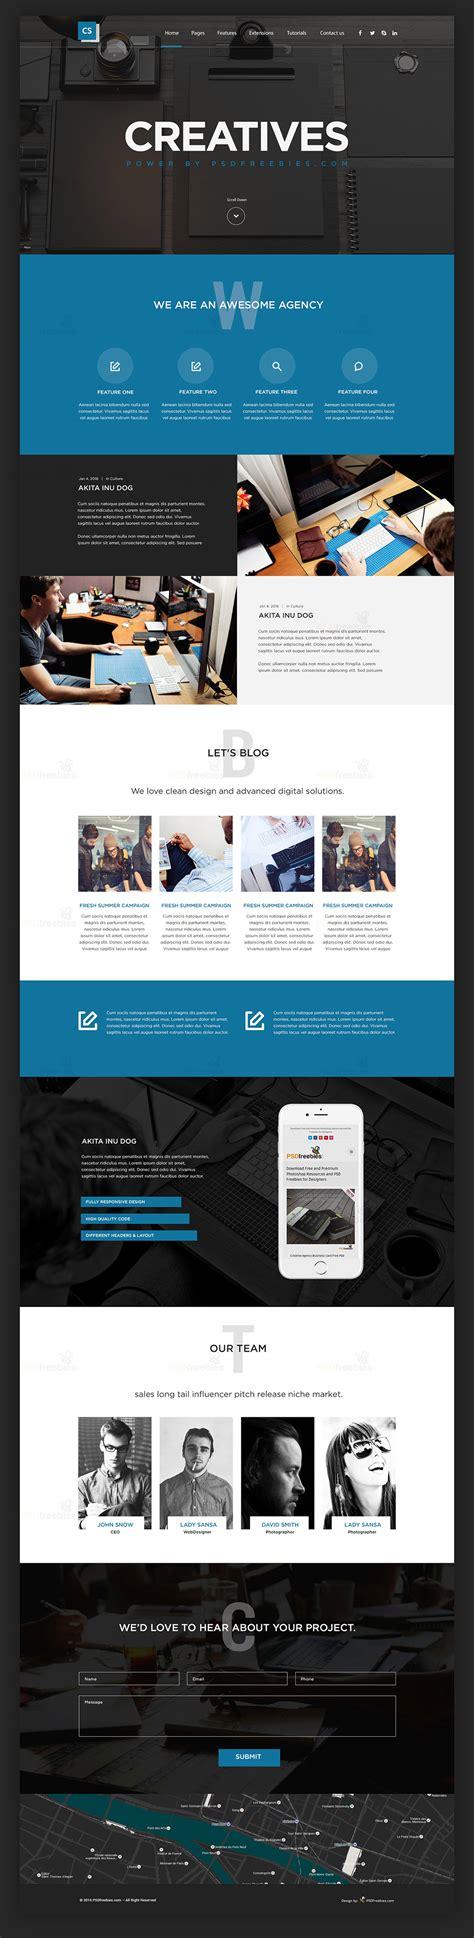 Digital Agency Template Creative Digital Agency Website Template Free Psd